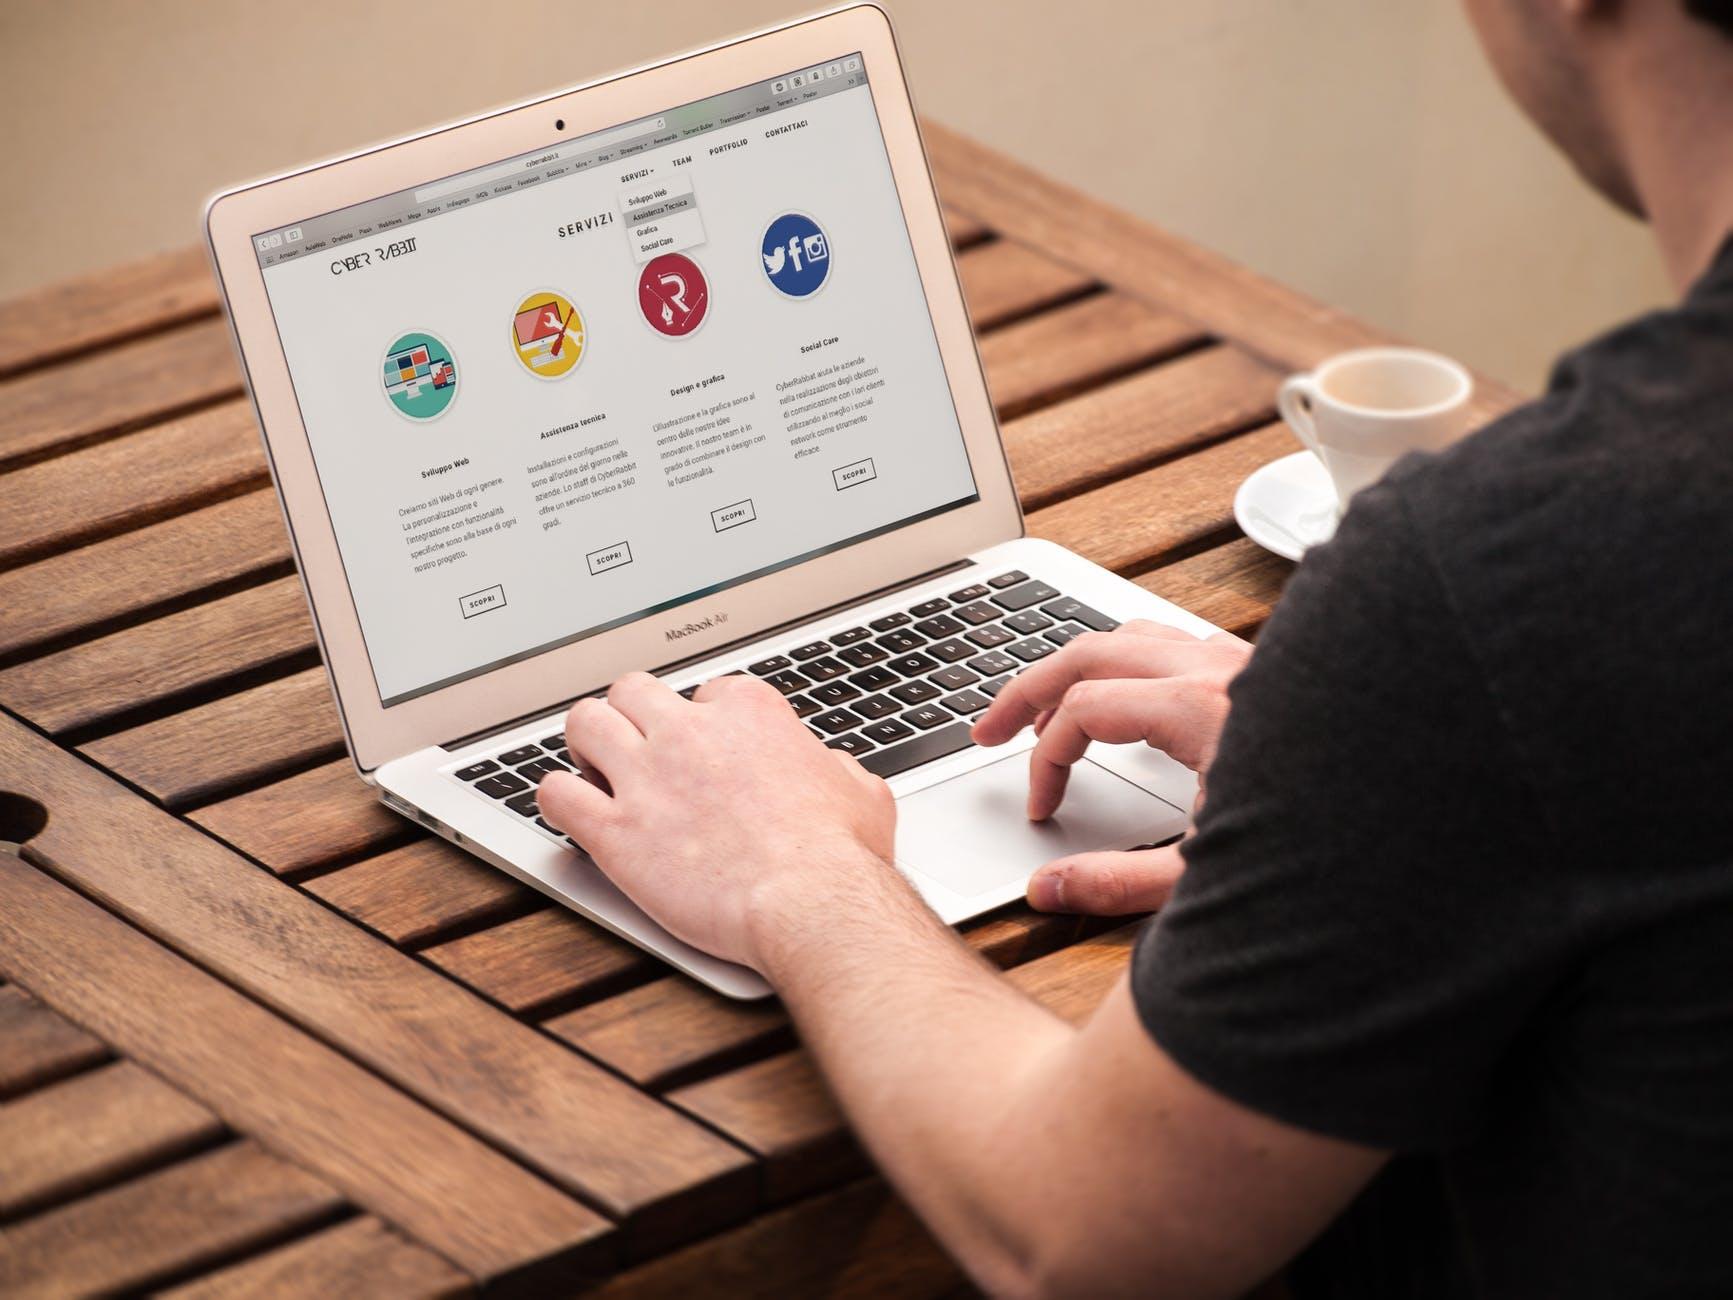 Barbat la laptop navigand pe internet